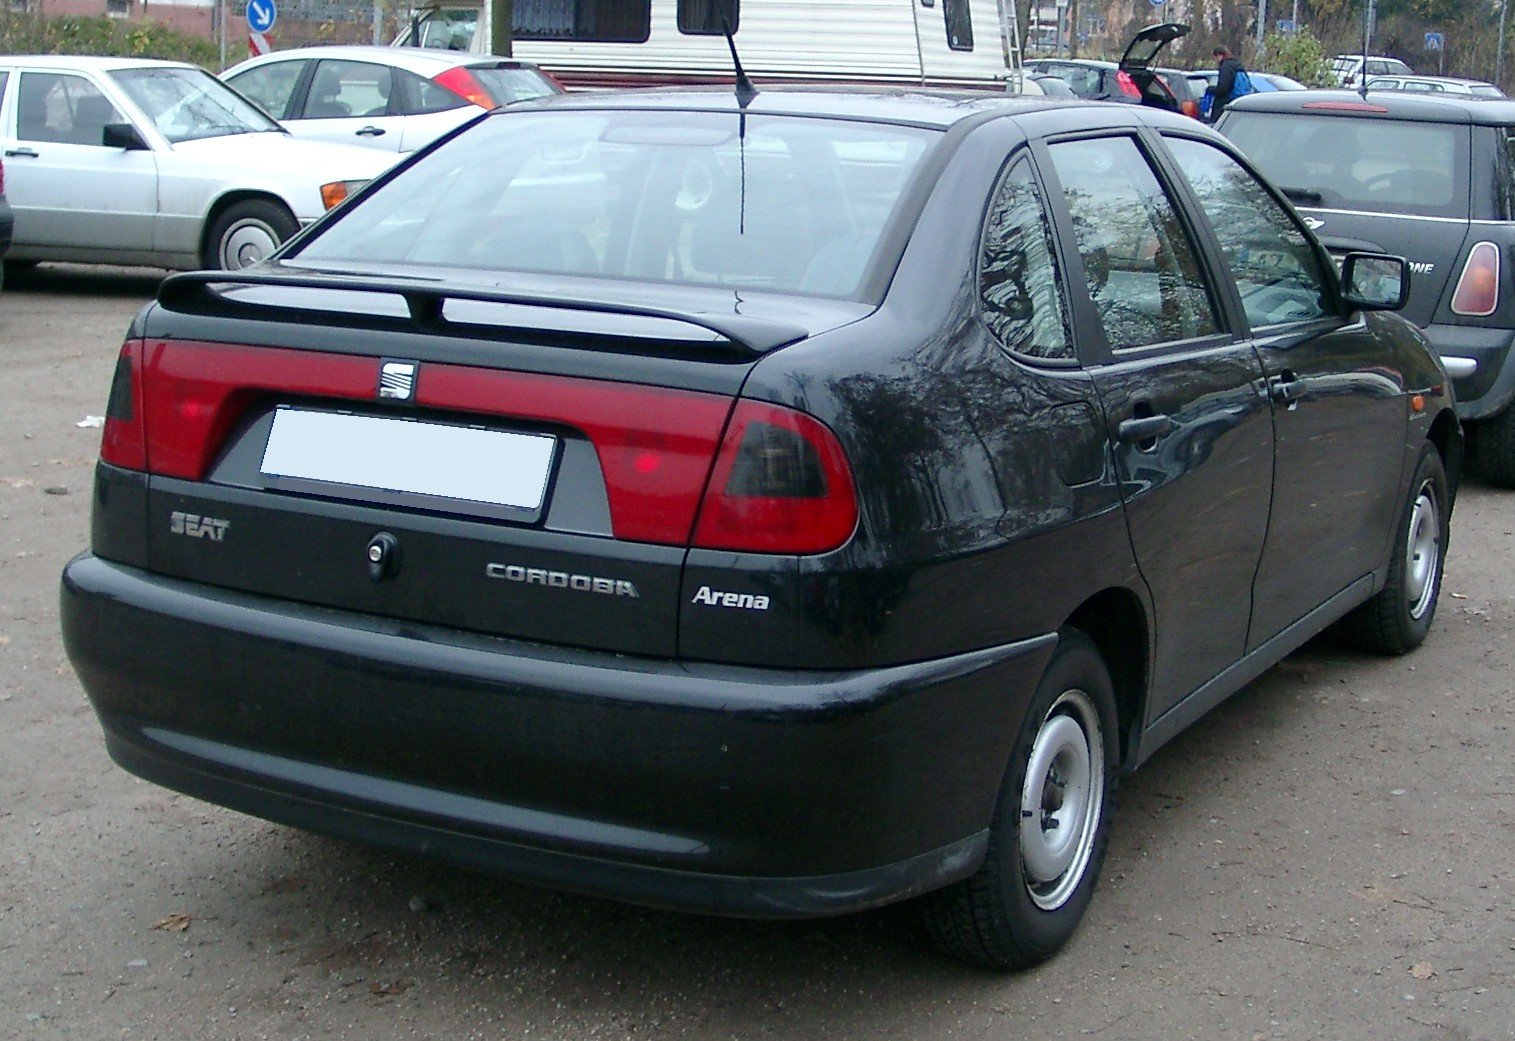 Cars Sport Seat Cordoba